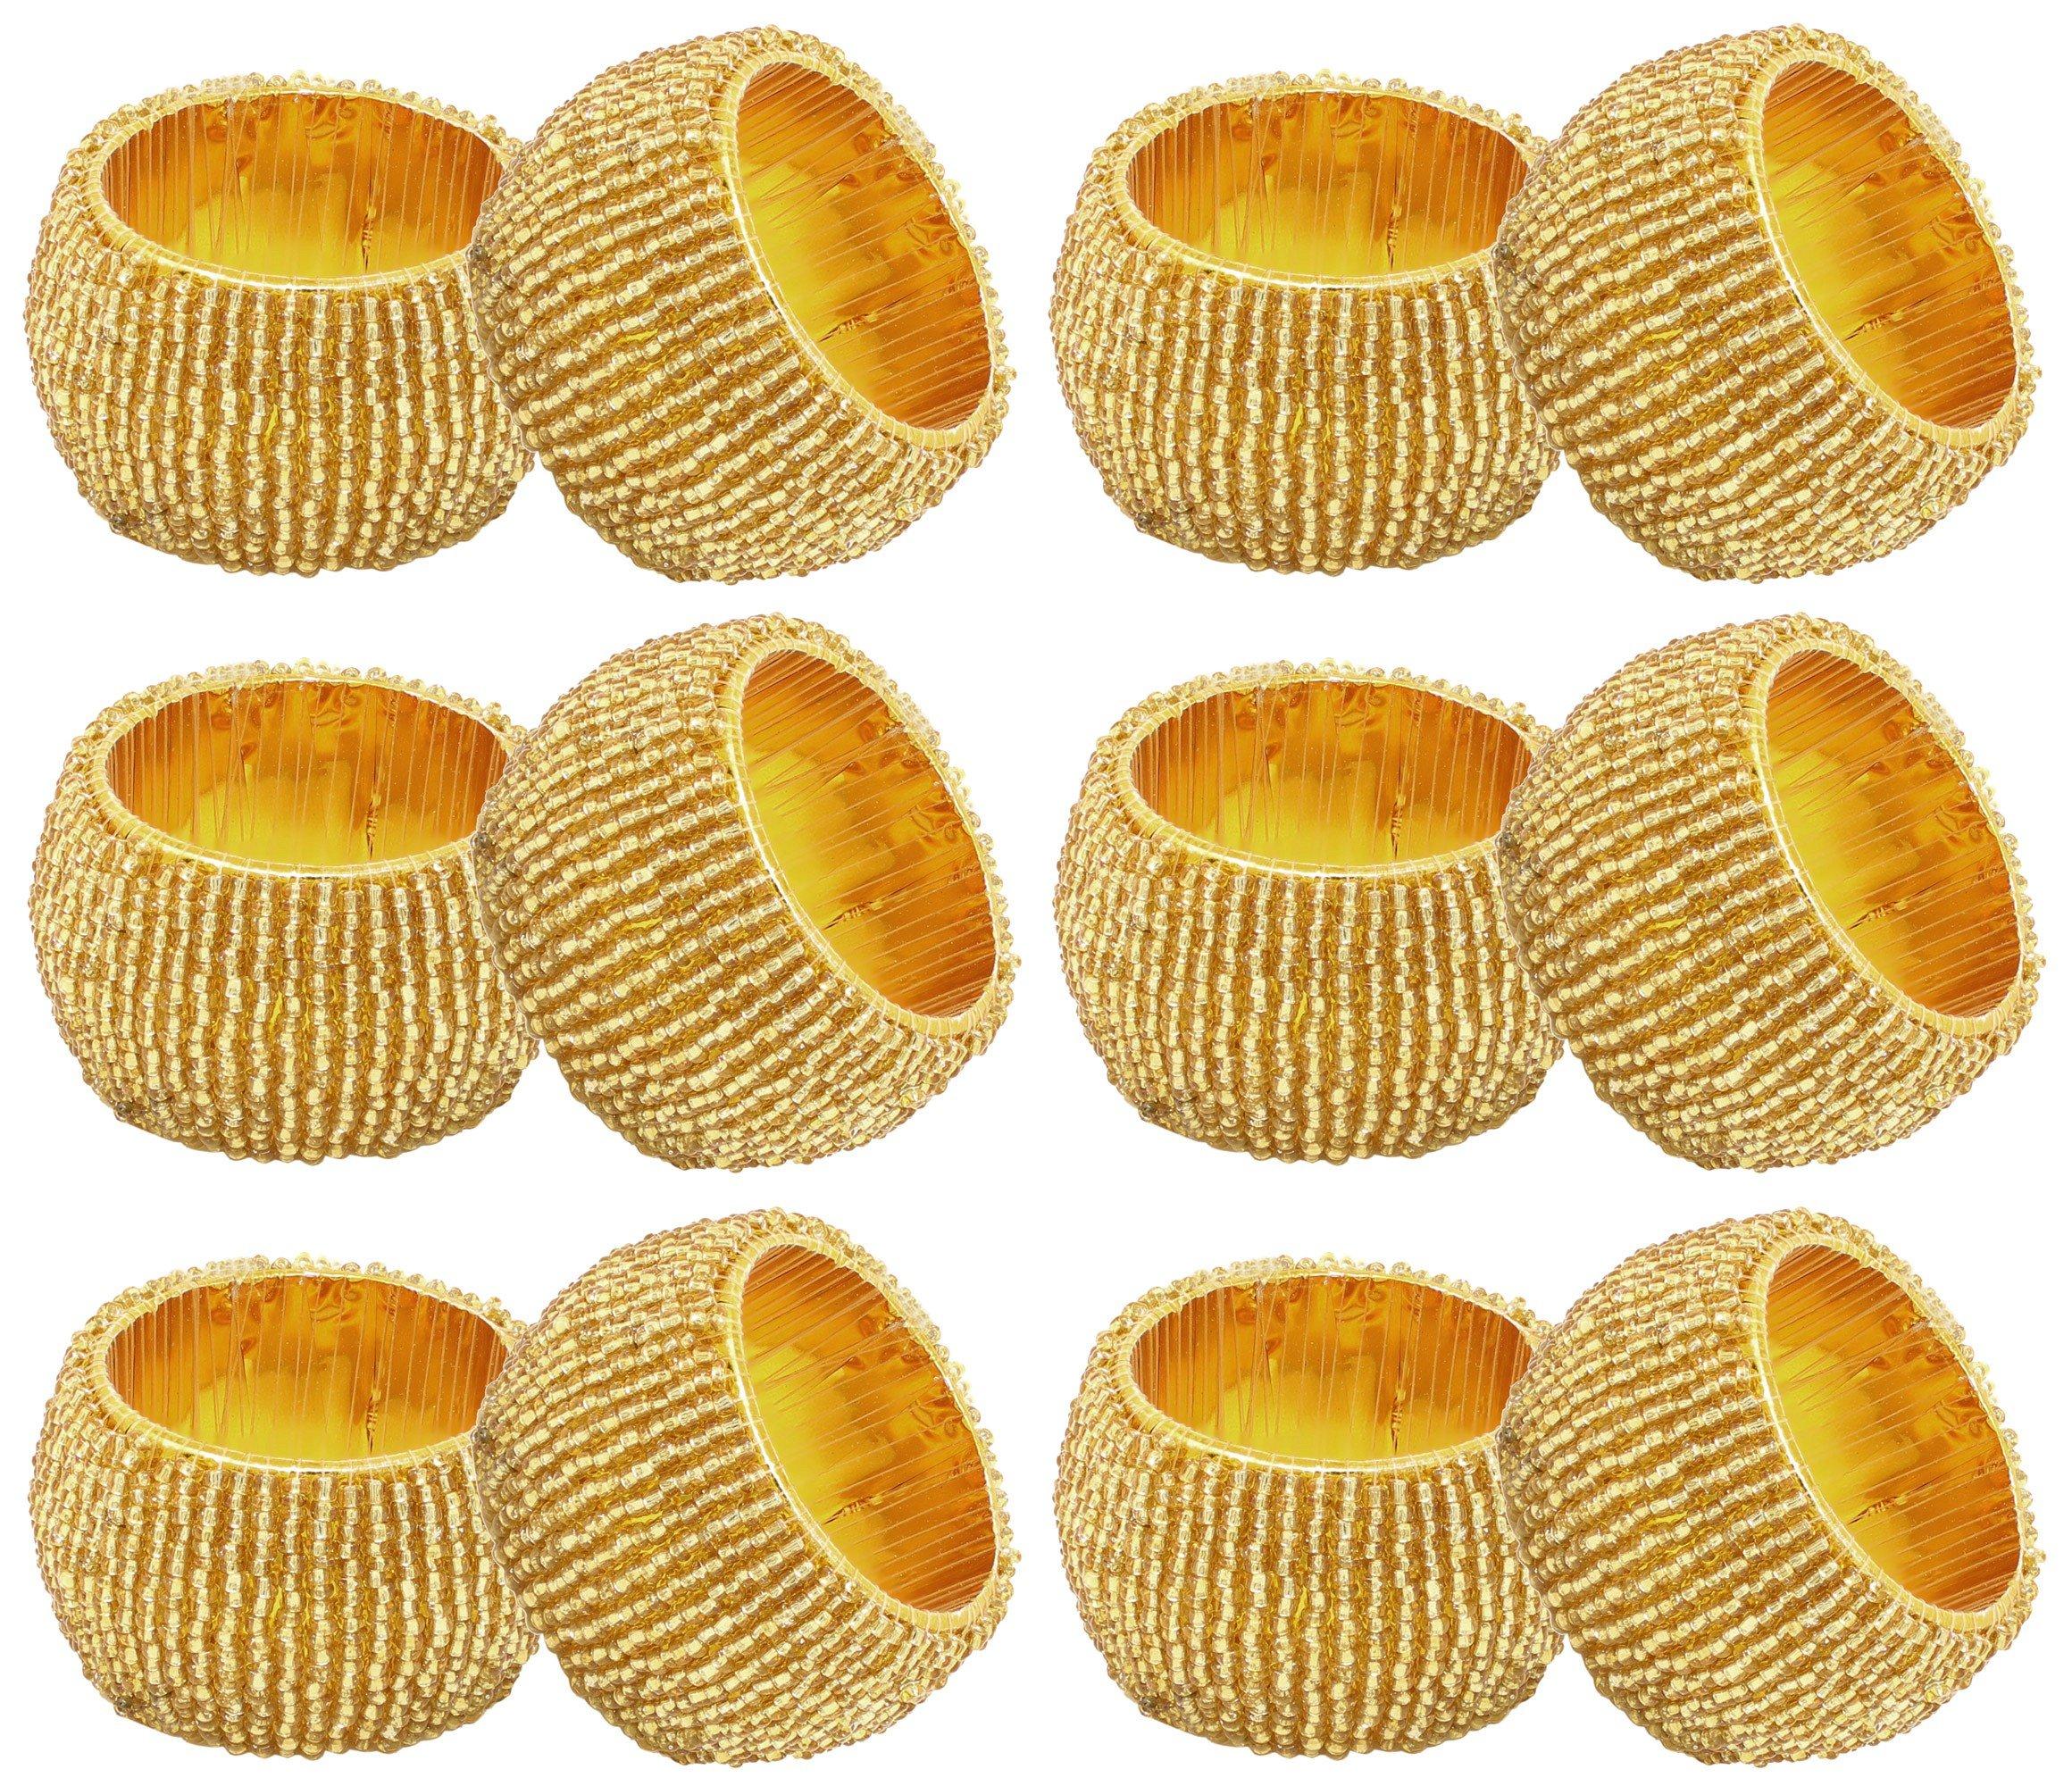 SKAVIJ Gold Napkin Rings Set of 12 Round Beaded Napkin Holder for Weddings Dinner Parties or Every Day Use